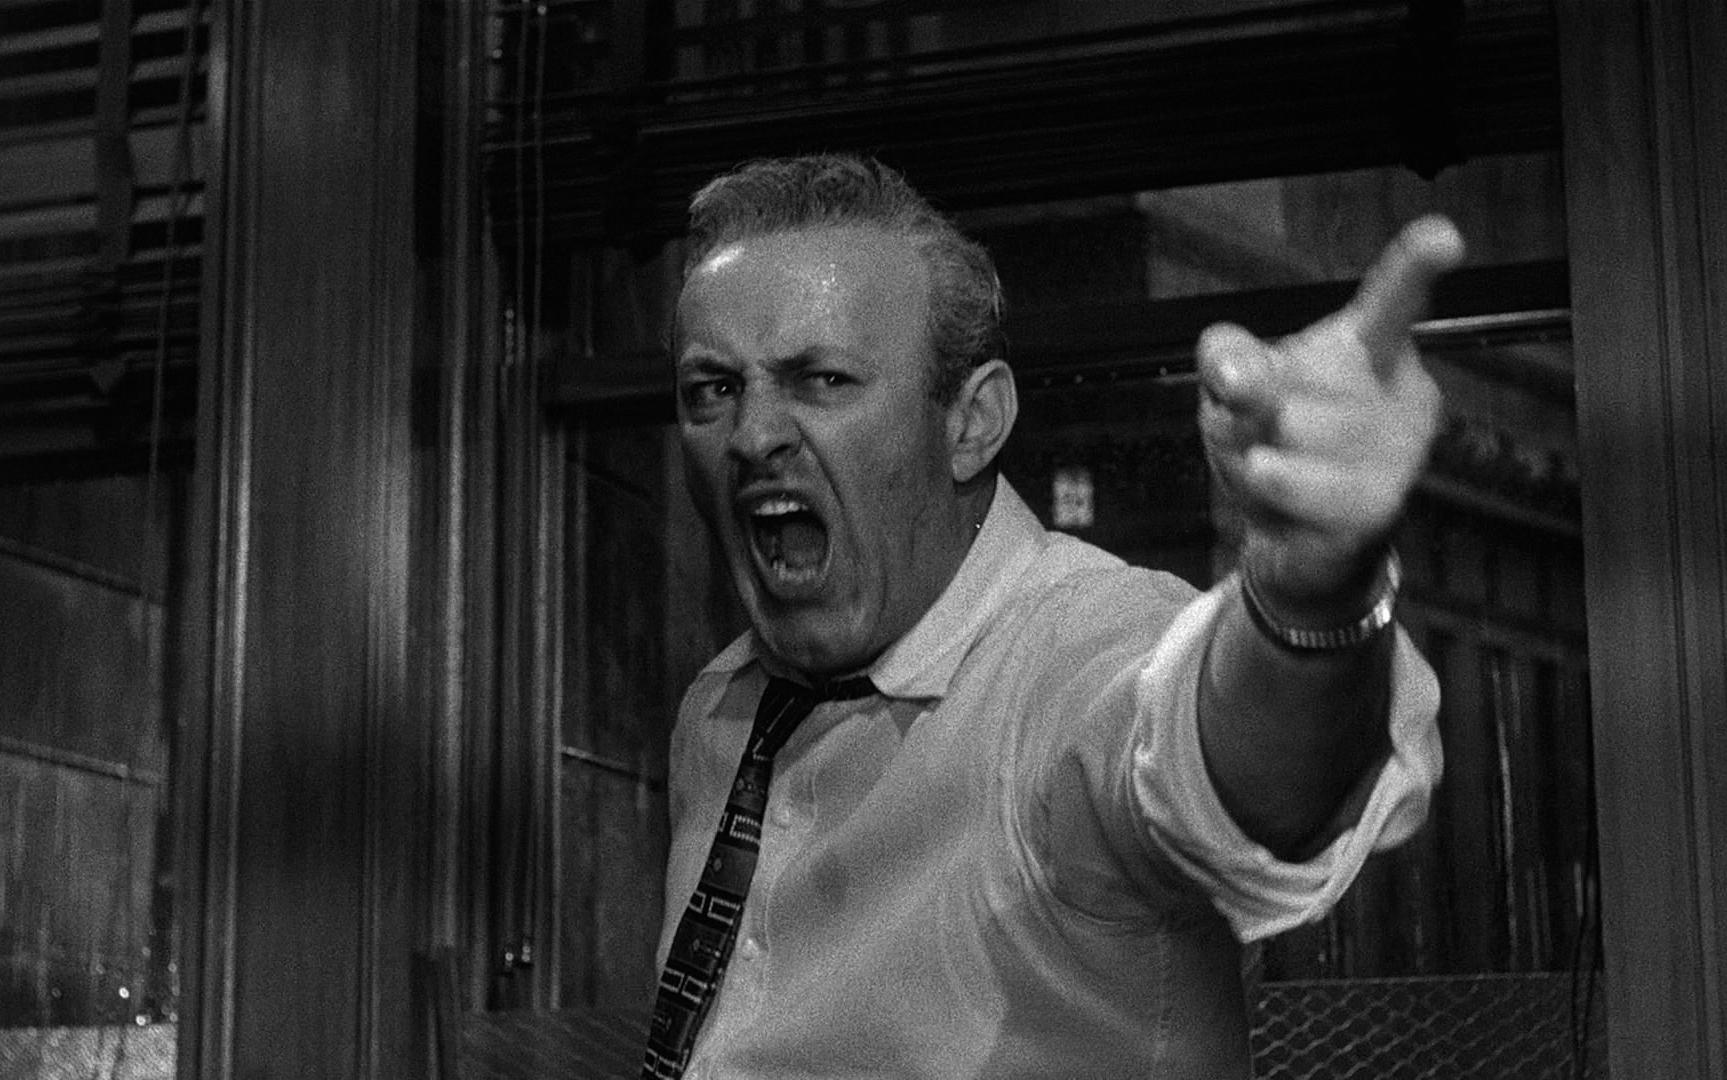 12 Angry Men: Lee J Cobb